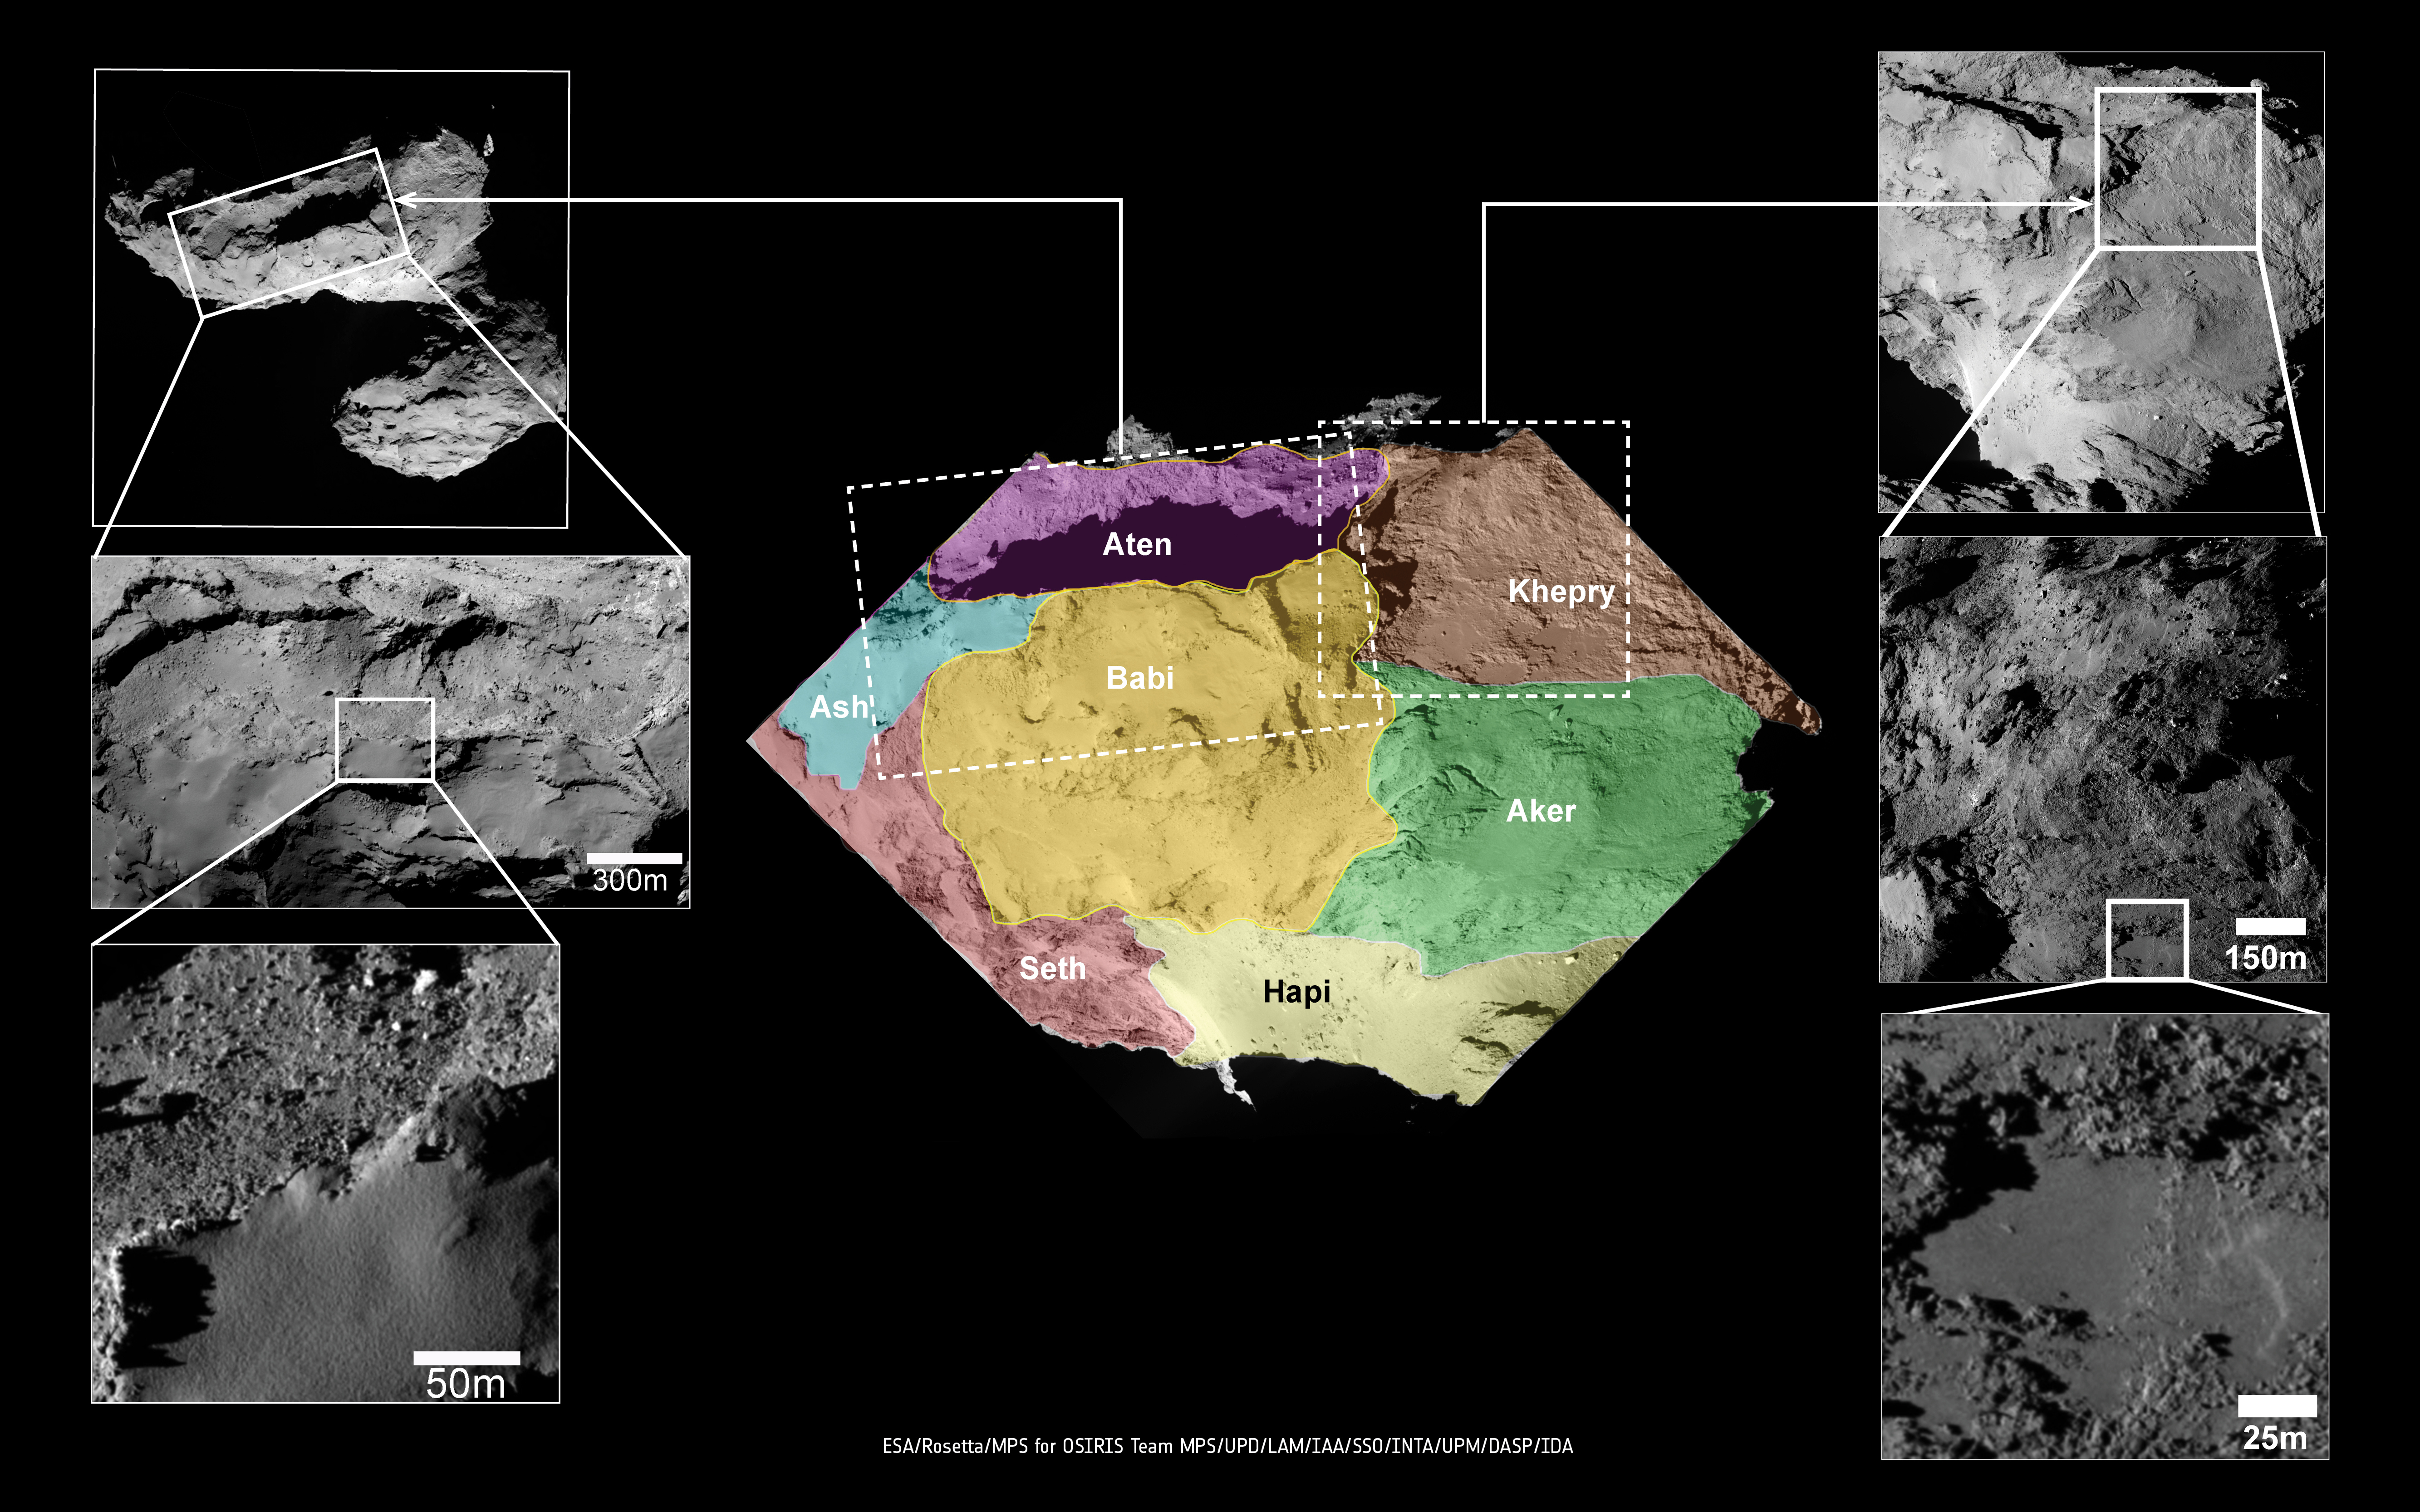 1567215816374-ESA_Rosetta_OSIRIS_Context_ElMaarry1.jpg